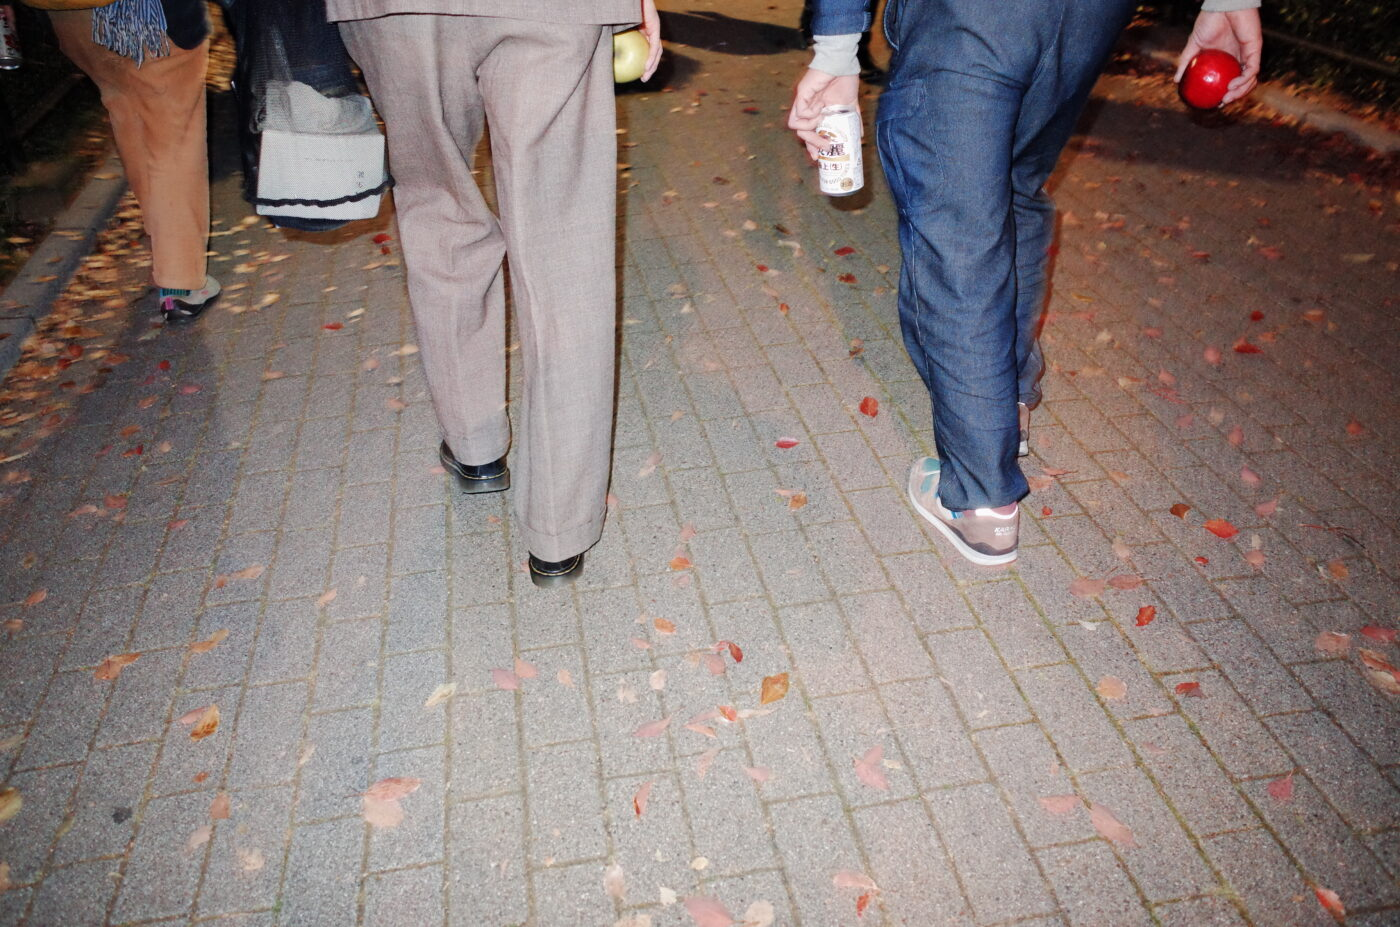 PHOTO REPORT|2221. 田辺桃ヶ池阿倍野飛田山王新世界天芝天王寺歩き 1/2